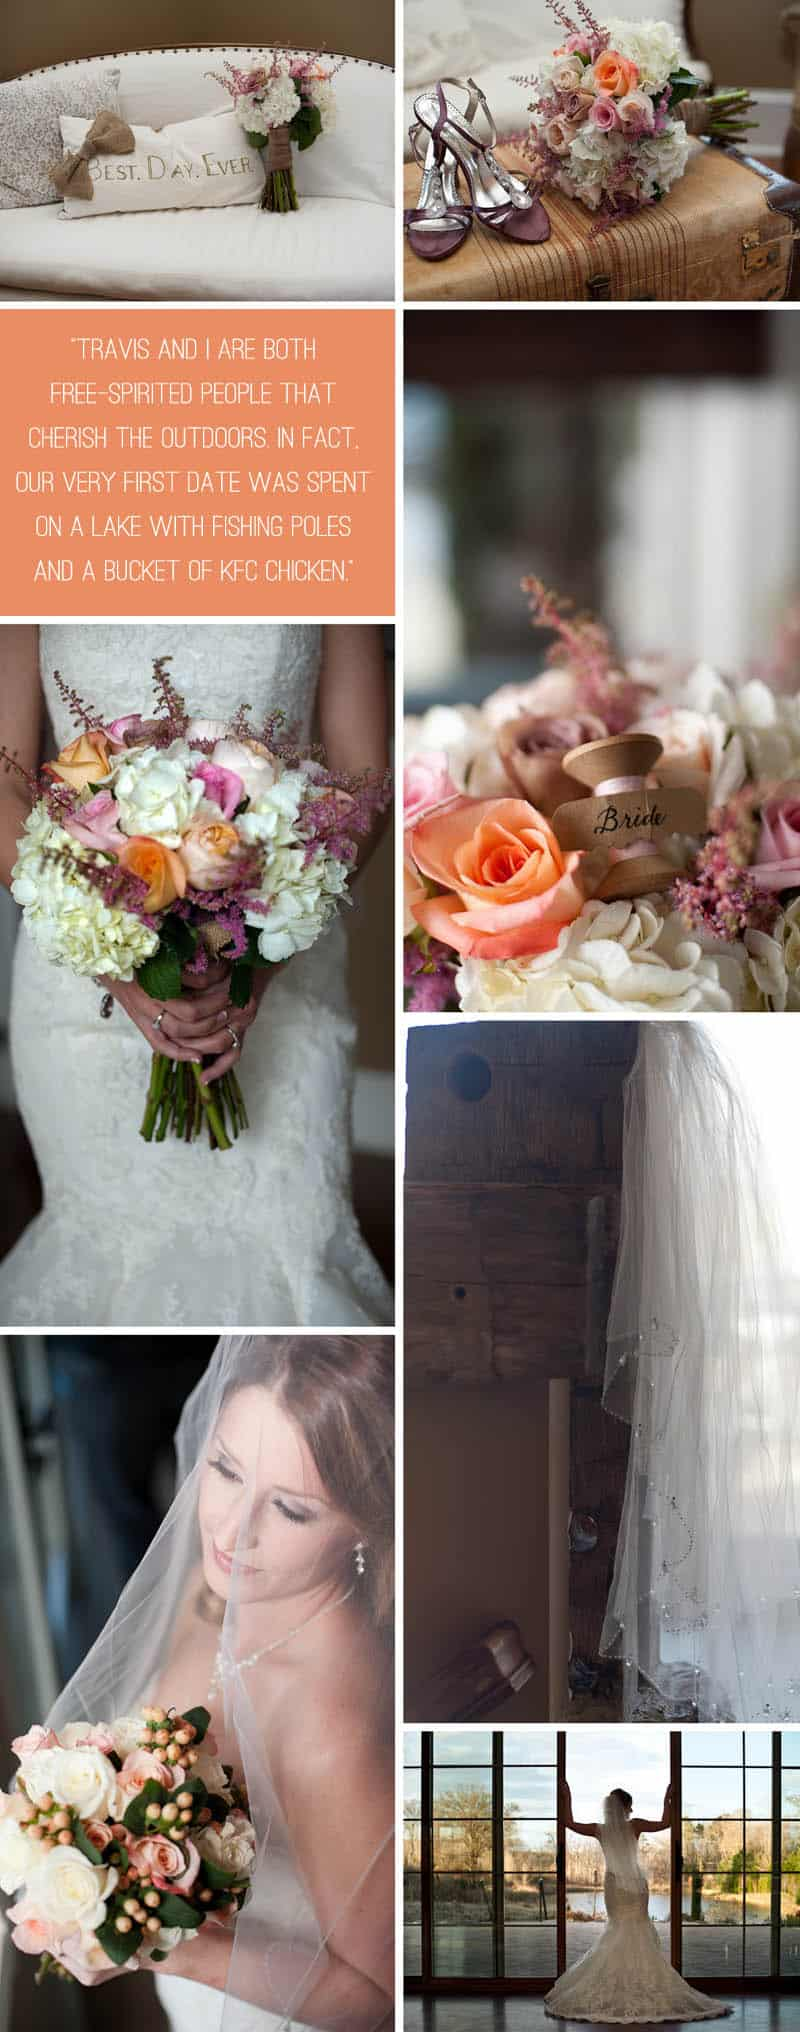 A Rustic Winter Wedding 2